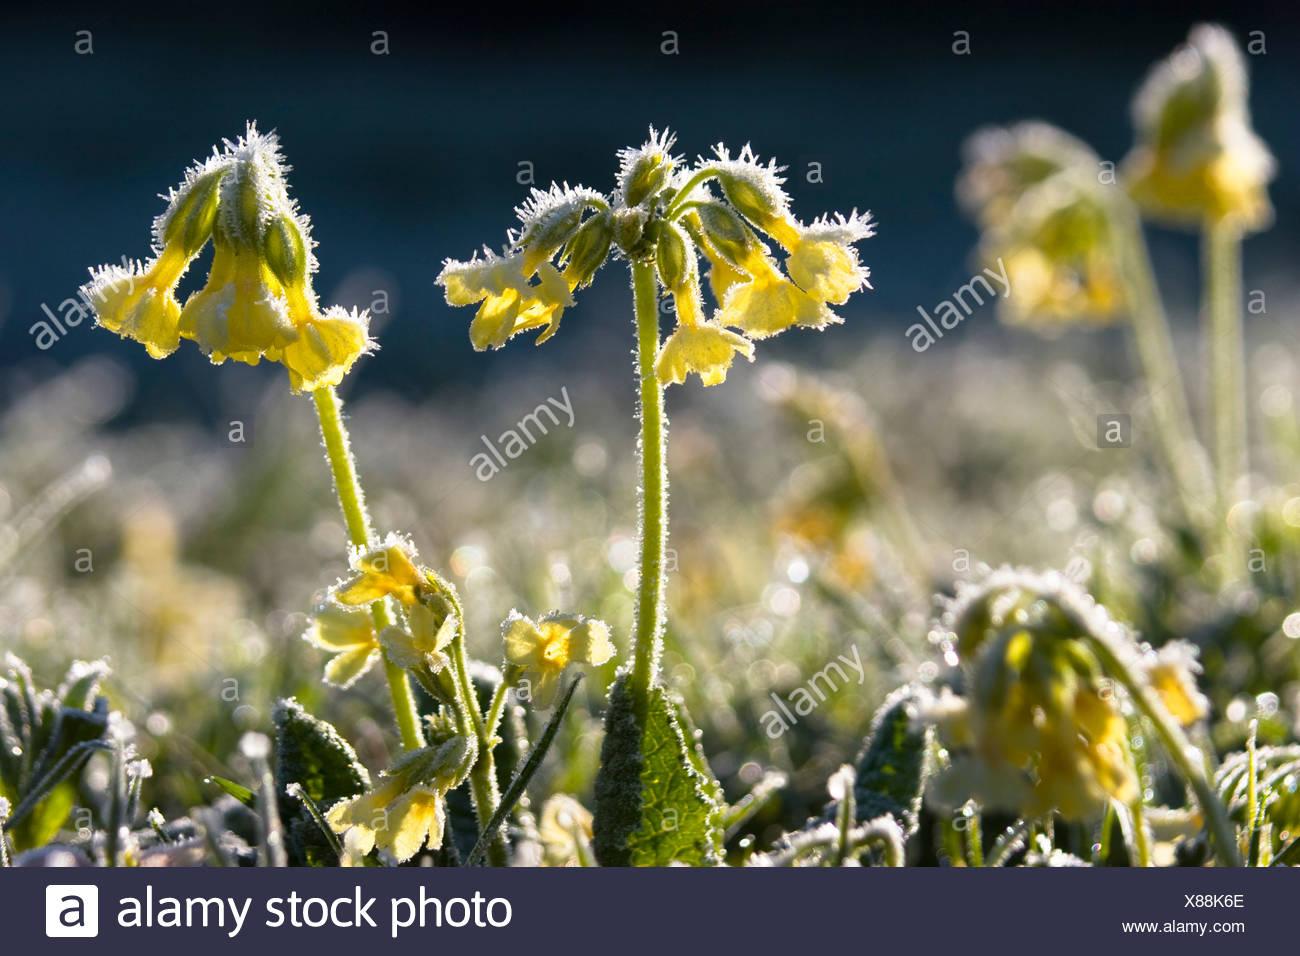 Primrose on meadow, Primula elatior, whitefrost, Upper Bavaria, Germany Stock Photo